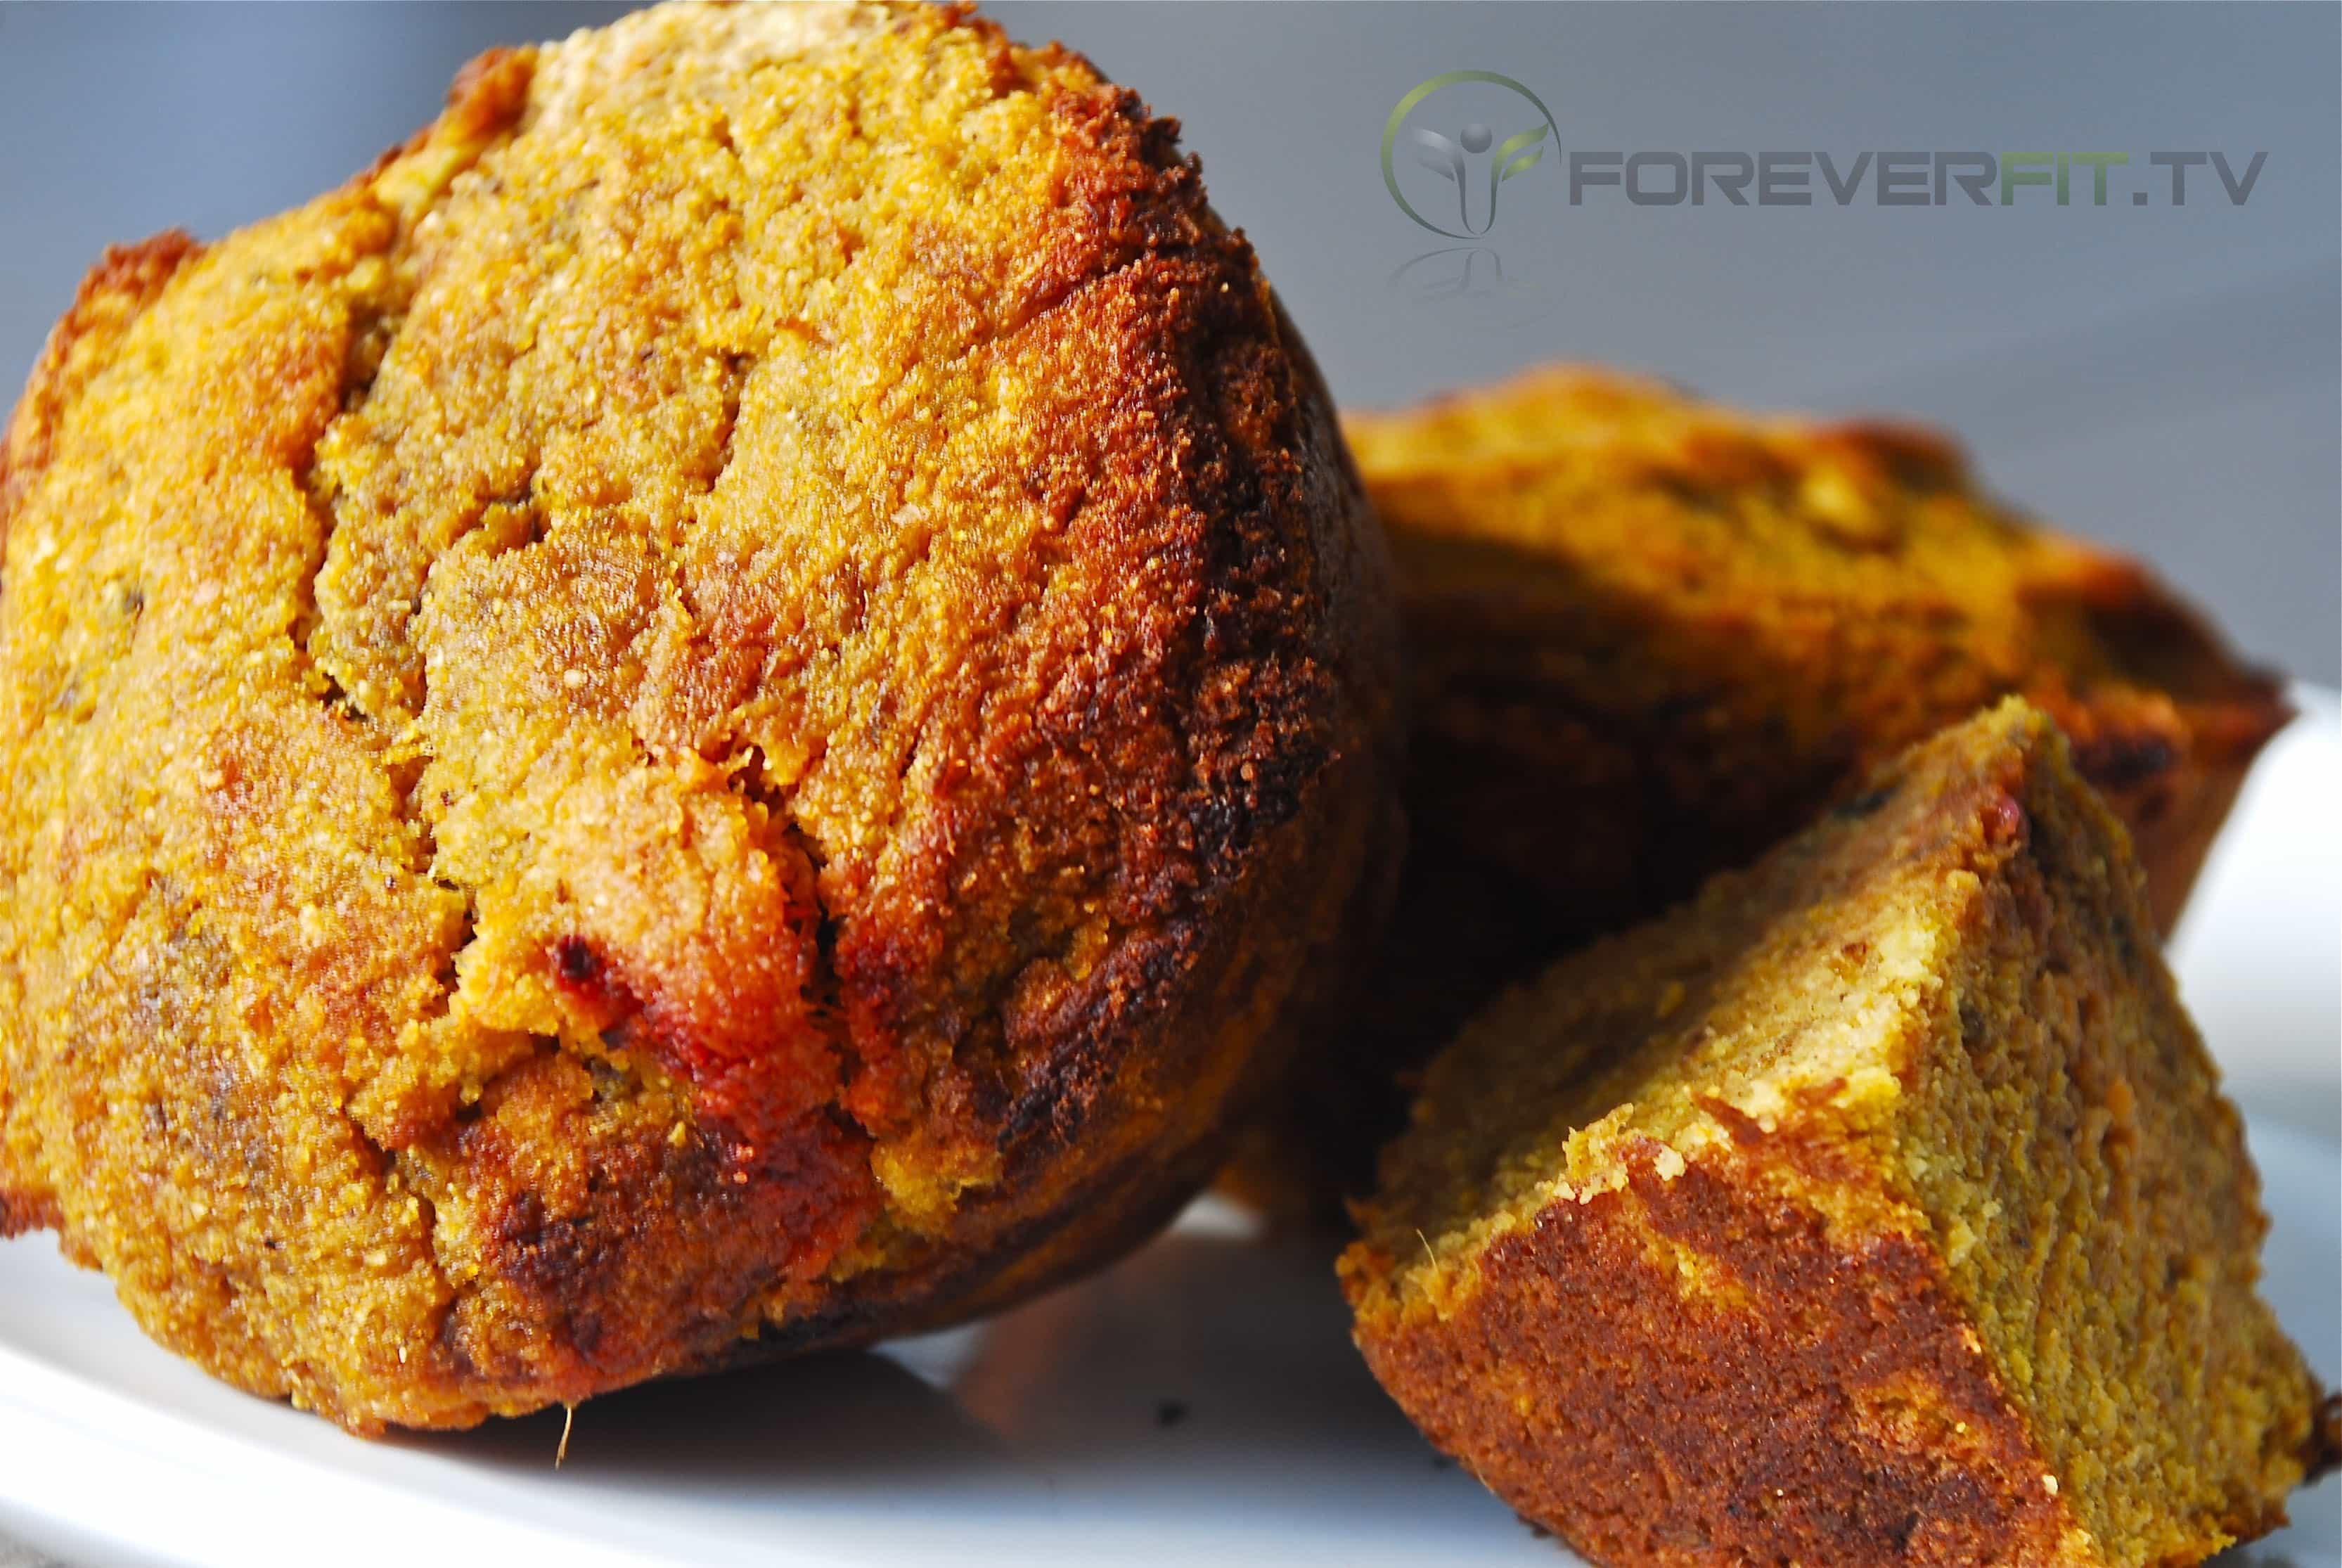 carrot-pulp-muffins